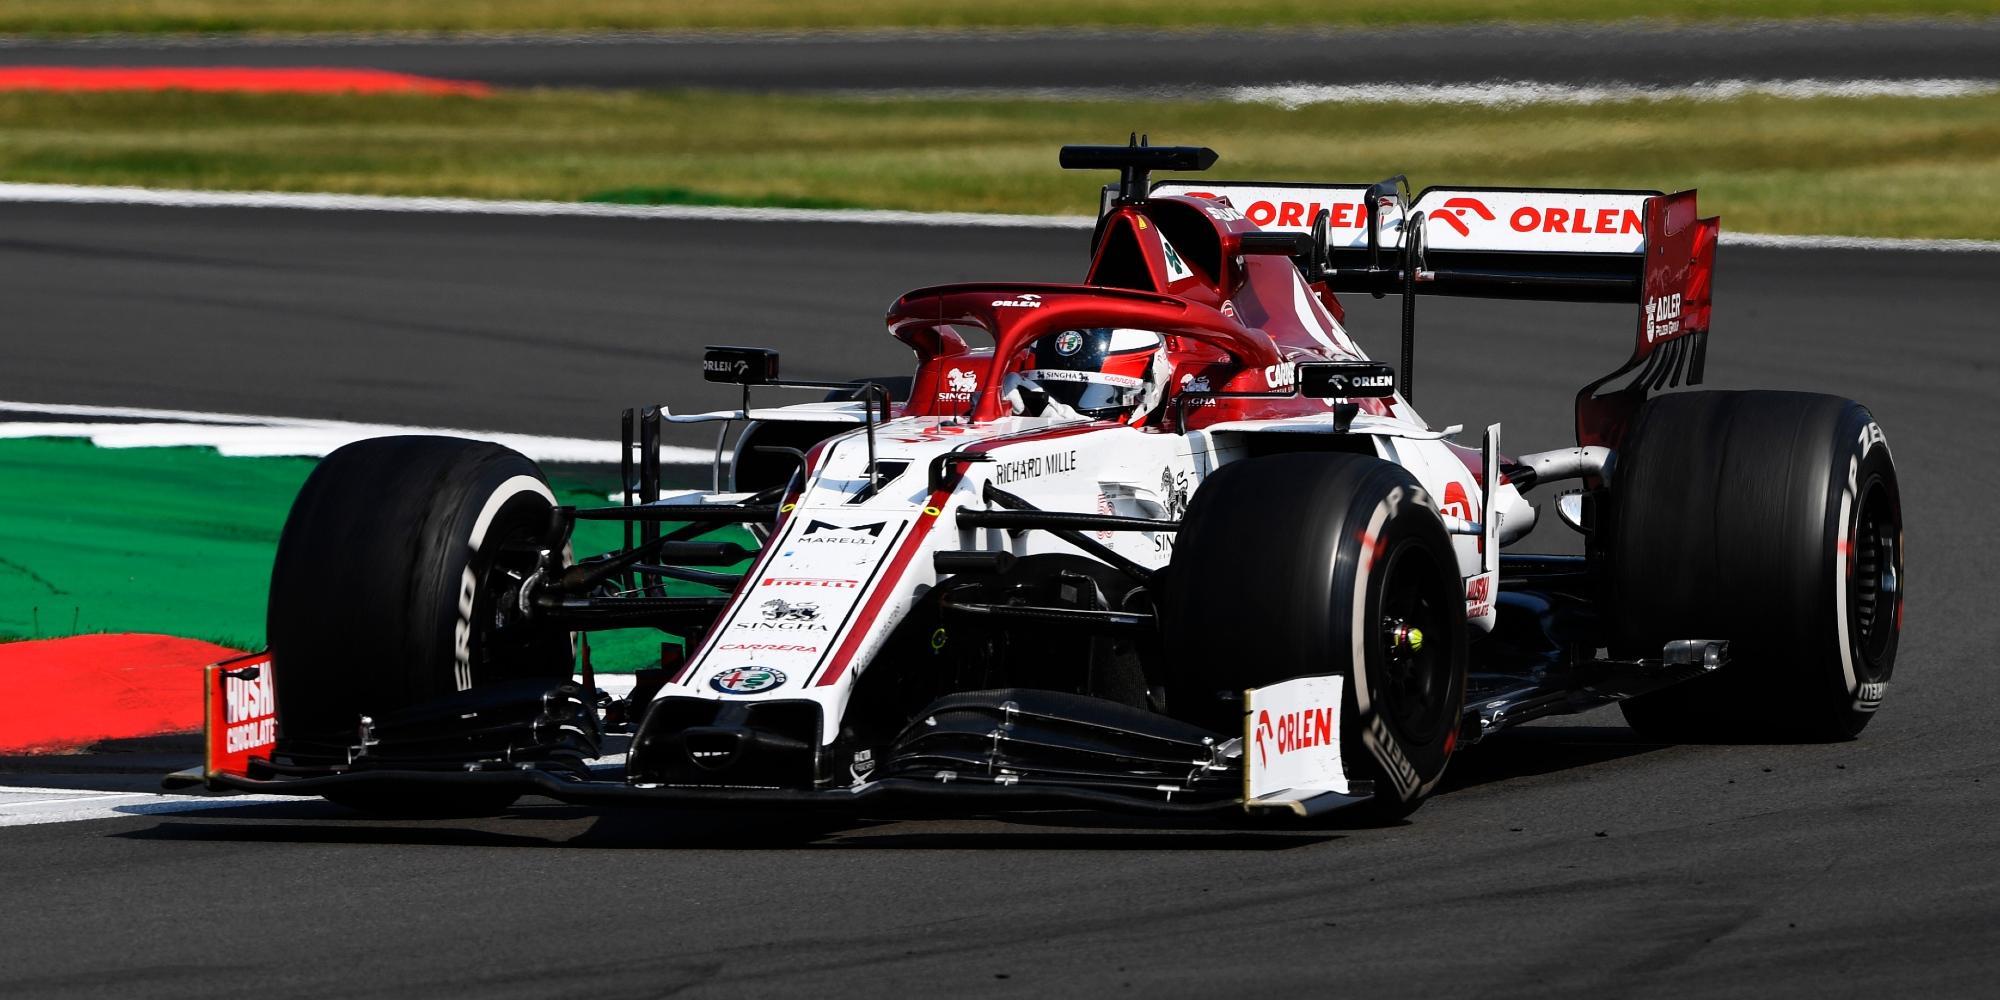 Kimi Raikkonen, 2020 70th Anniversary GP